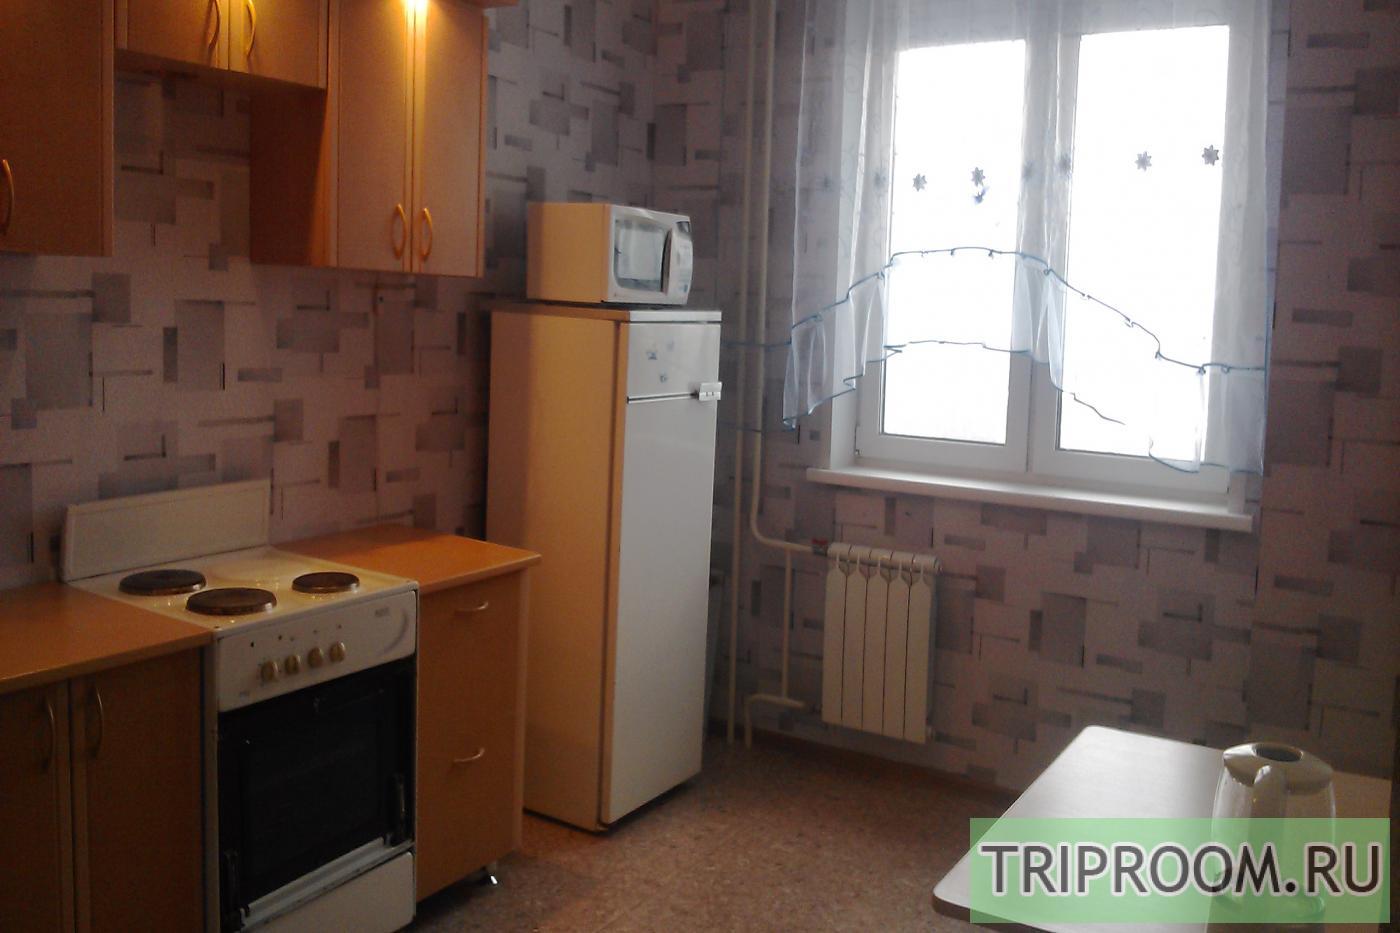 1-комнатная квартира посуточно (вариант № 5895), ул. Алексеева улица, фото № 2